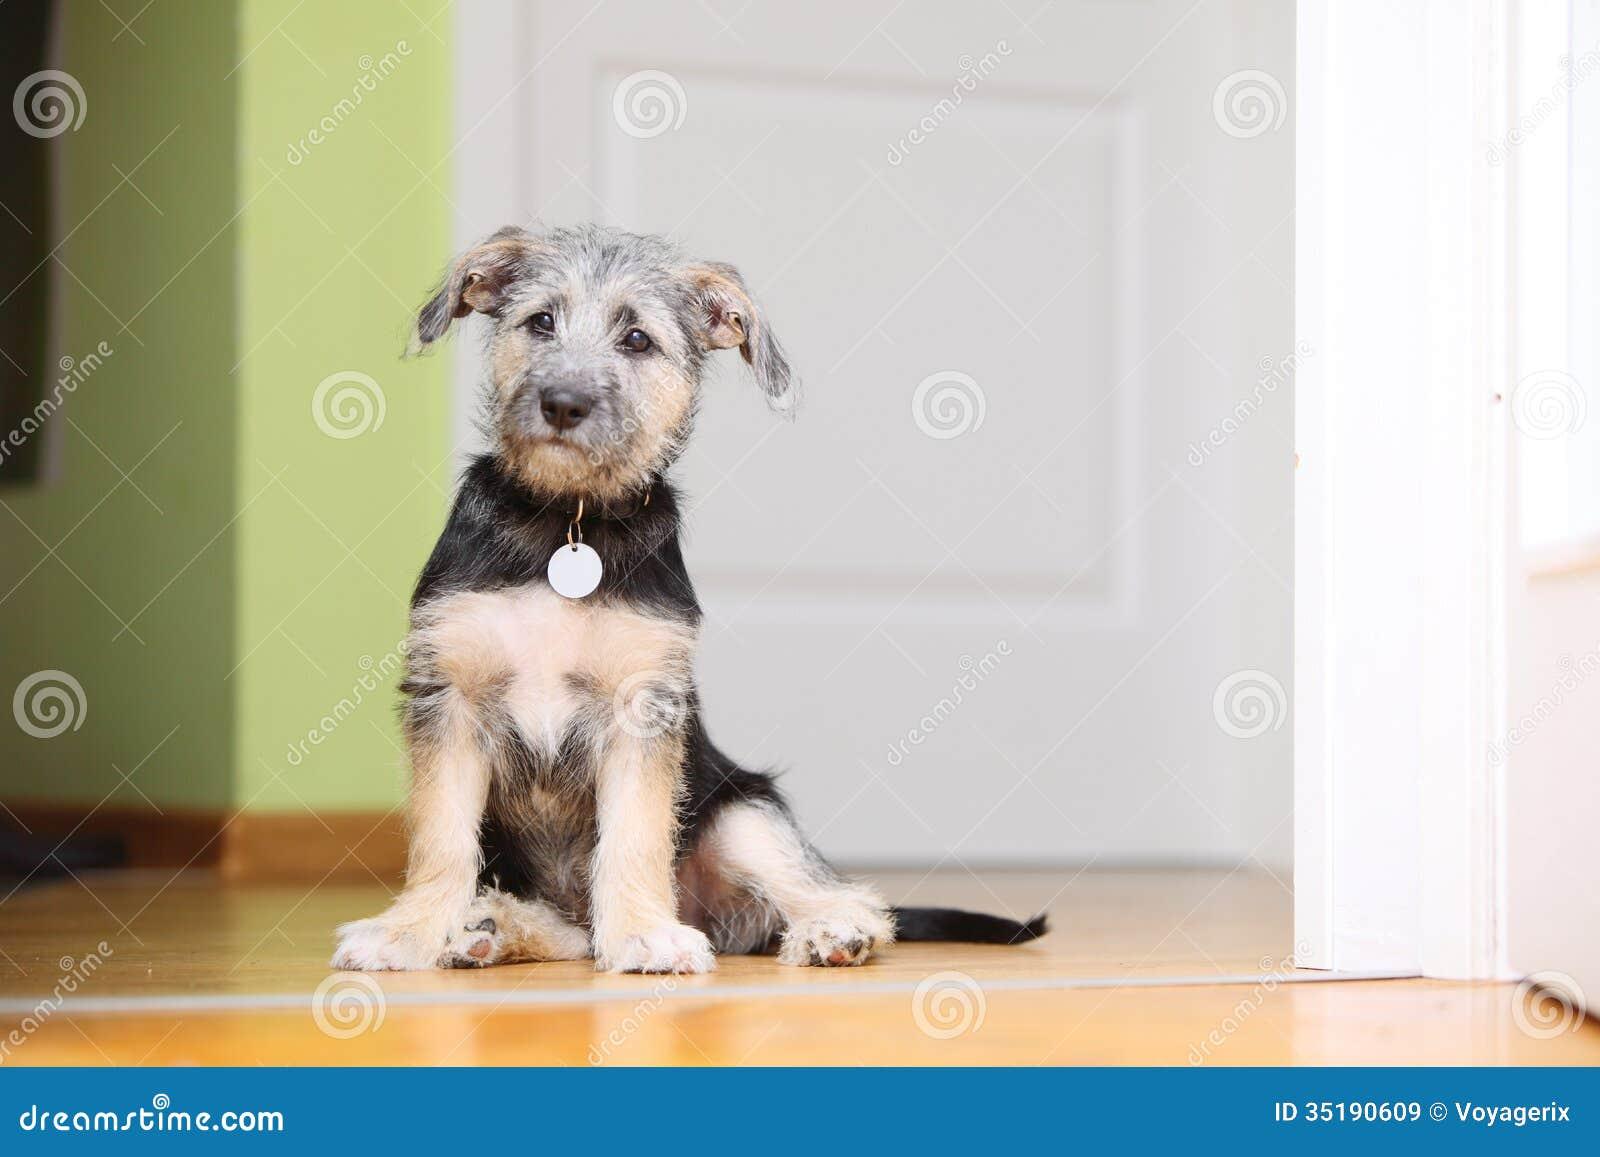 Animals at home dog pet mutt puppy sitting on floor